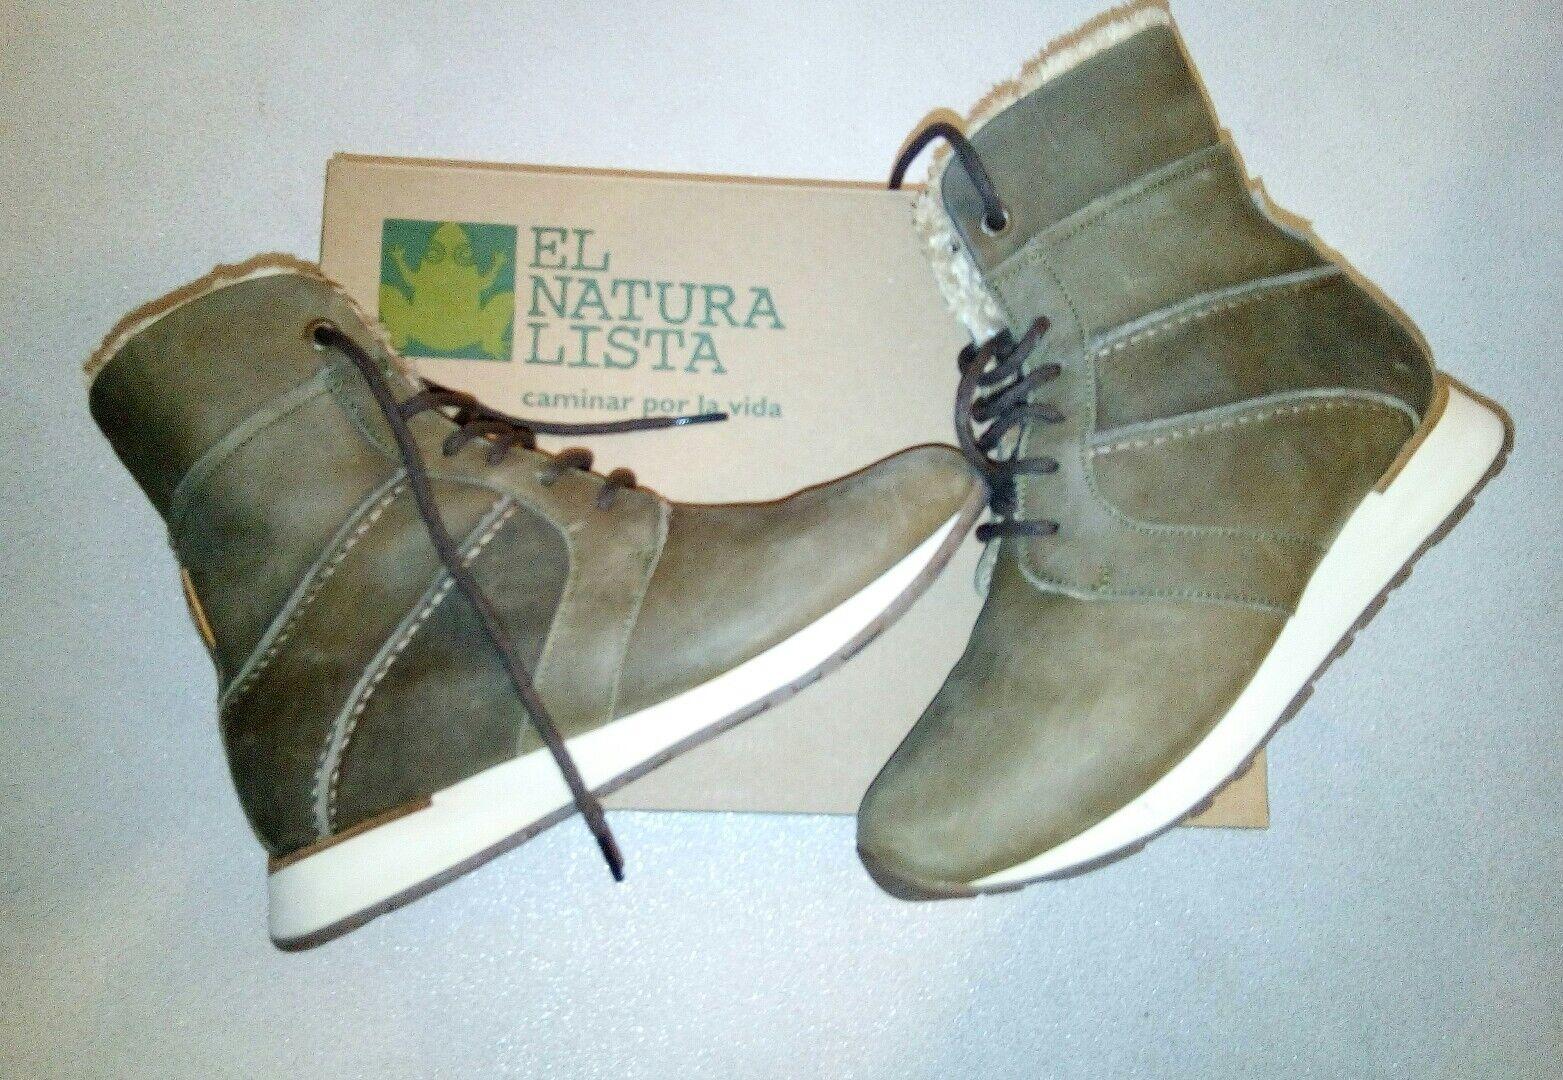 El Naturalista Damen Stiefel, Knöchelstiefel,Winter Sneaker Gr. 37 #NEU#